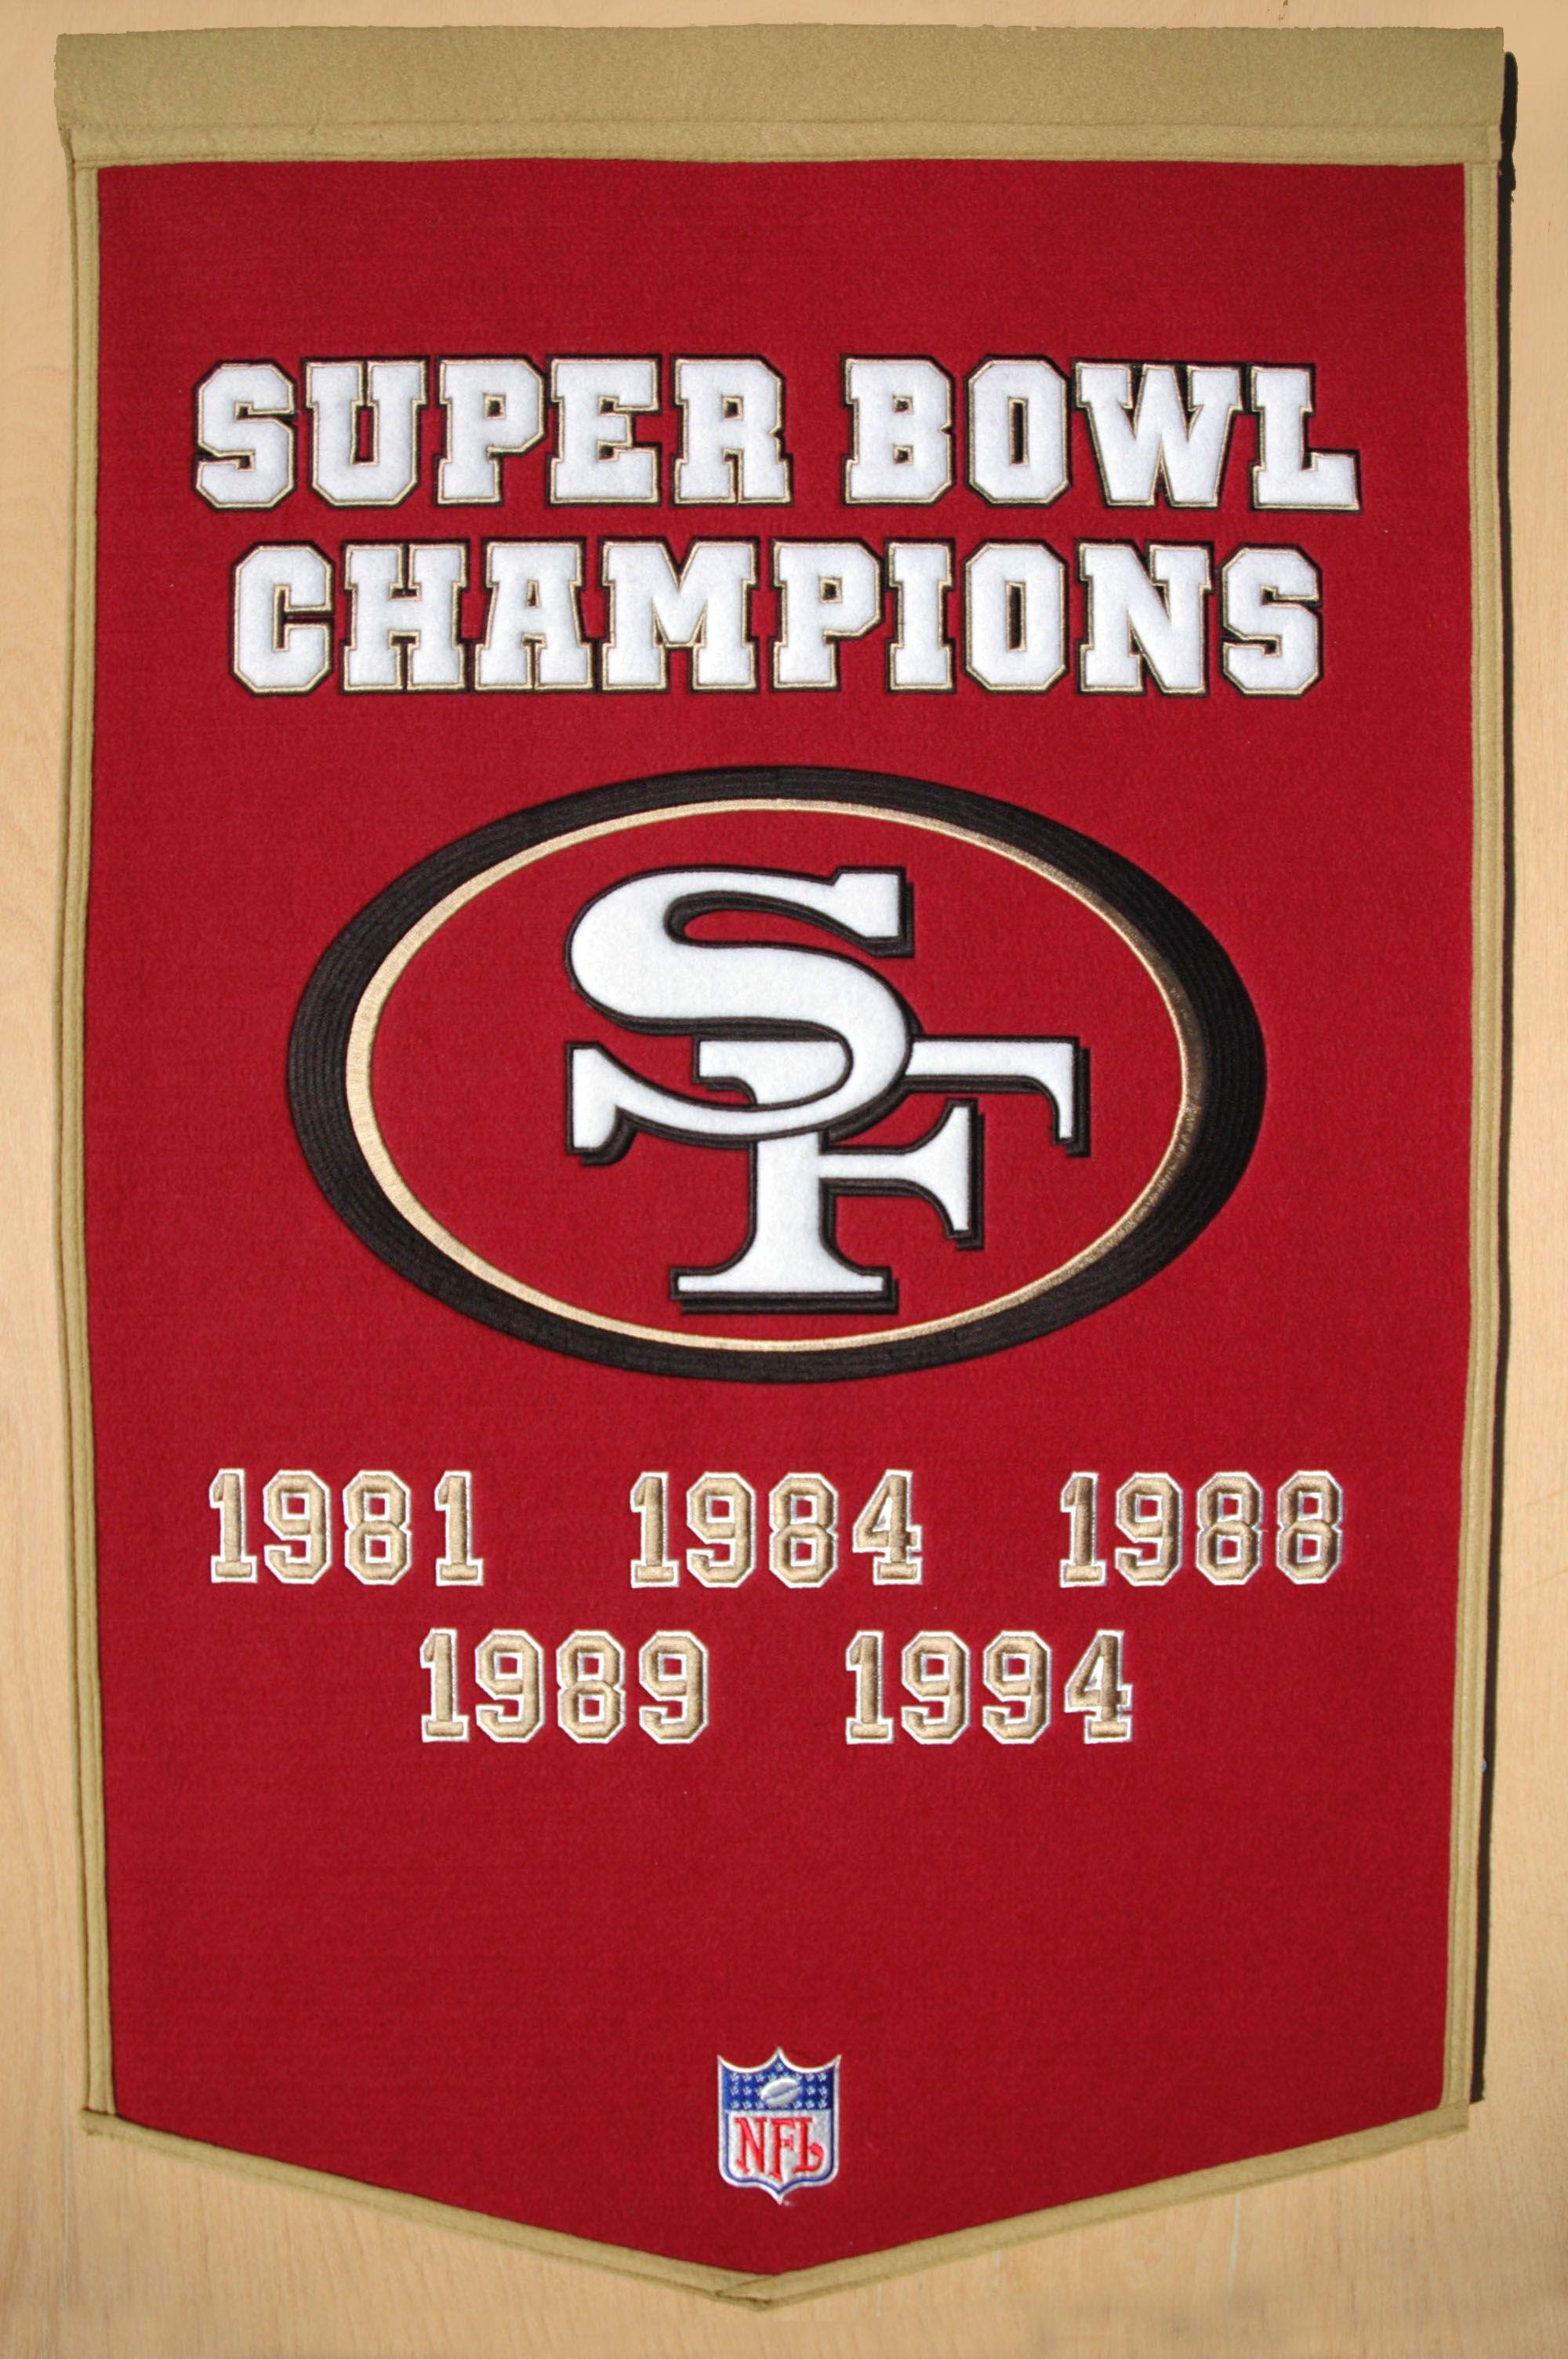 b92c6897f Super Bowl Champions 1981 1984 1988 1989 1994 Nfl San Francisco